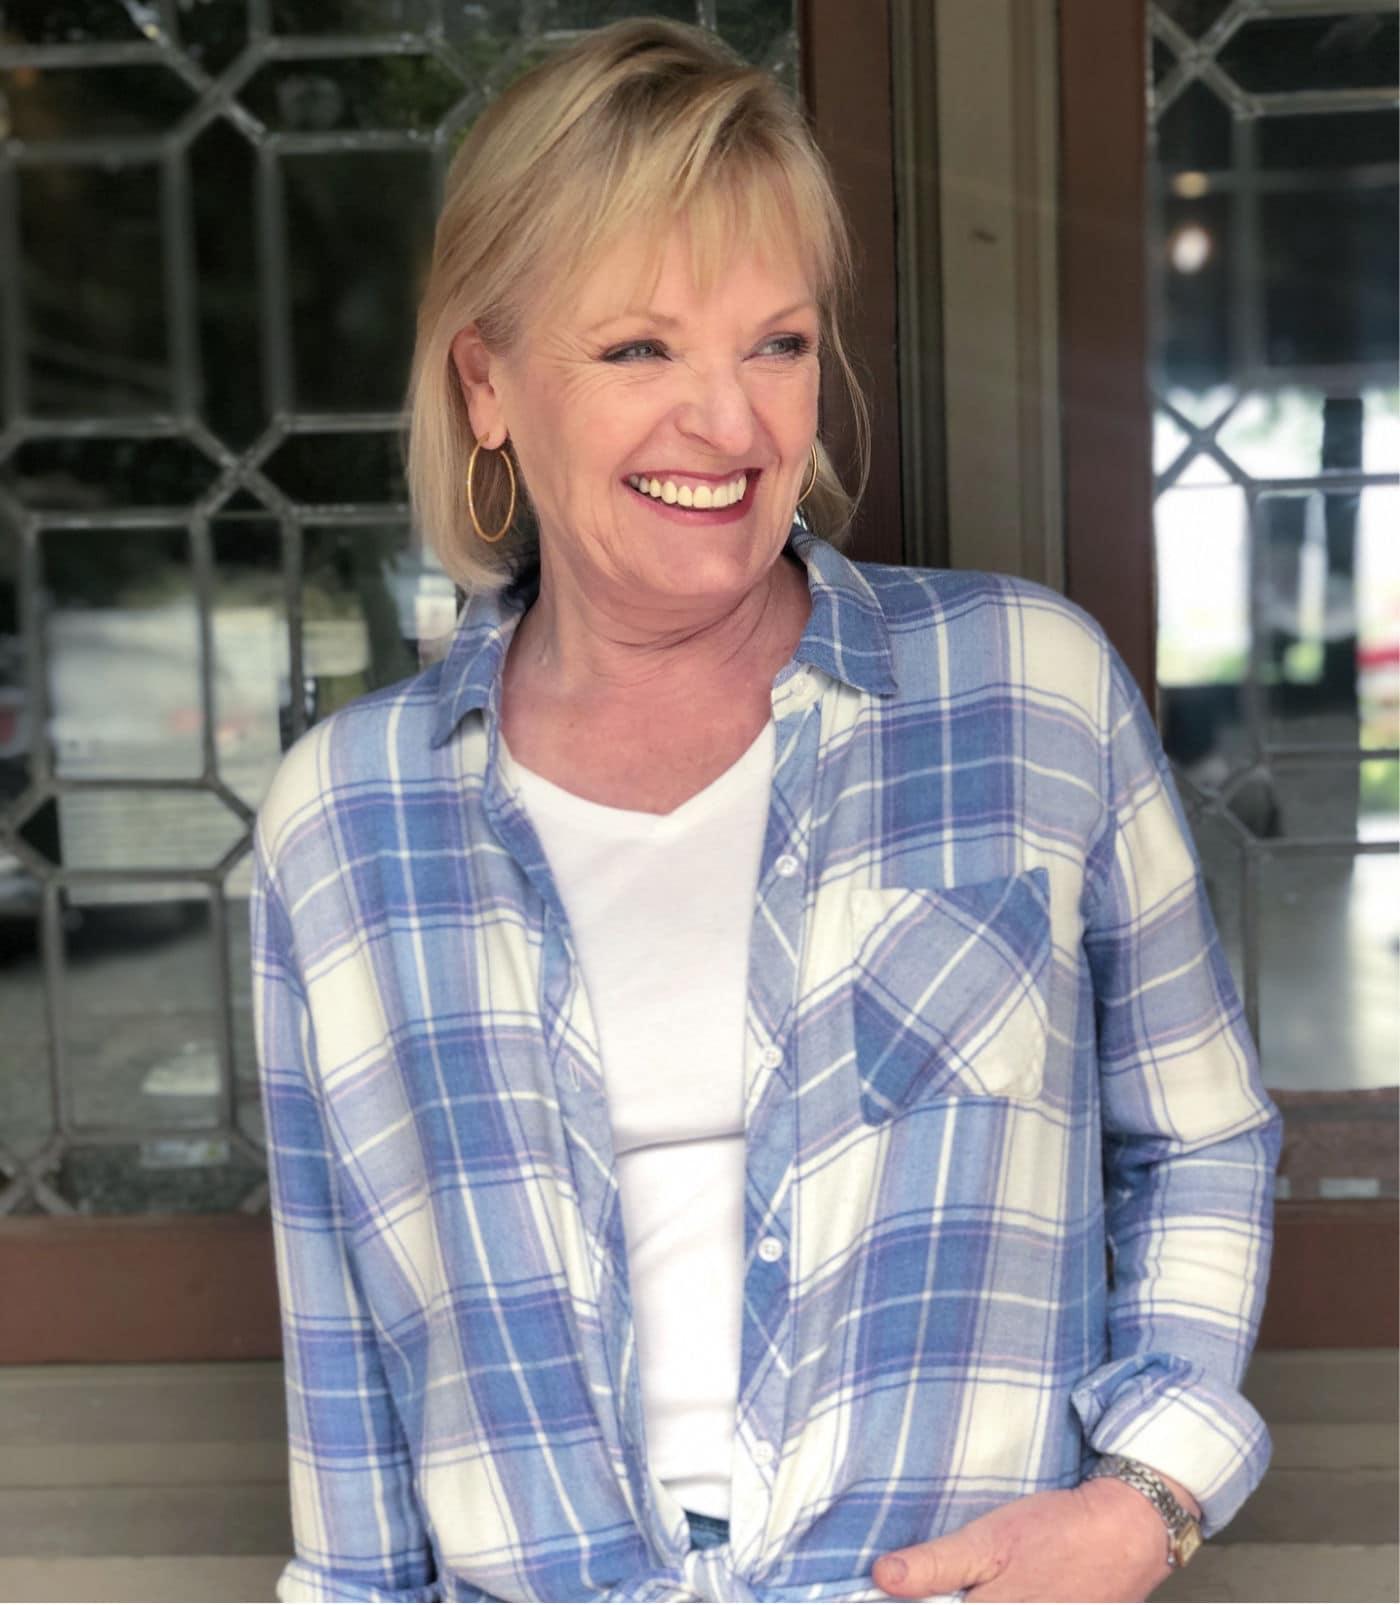 fashion blogger jennifer connolly wearing rails plaid flannel shirt